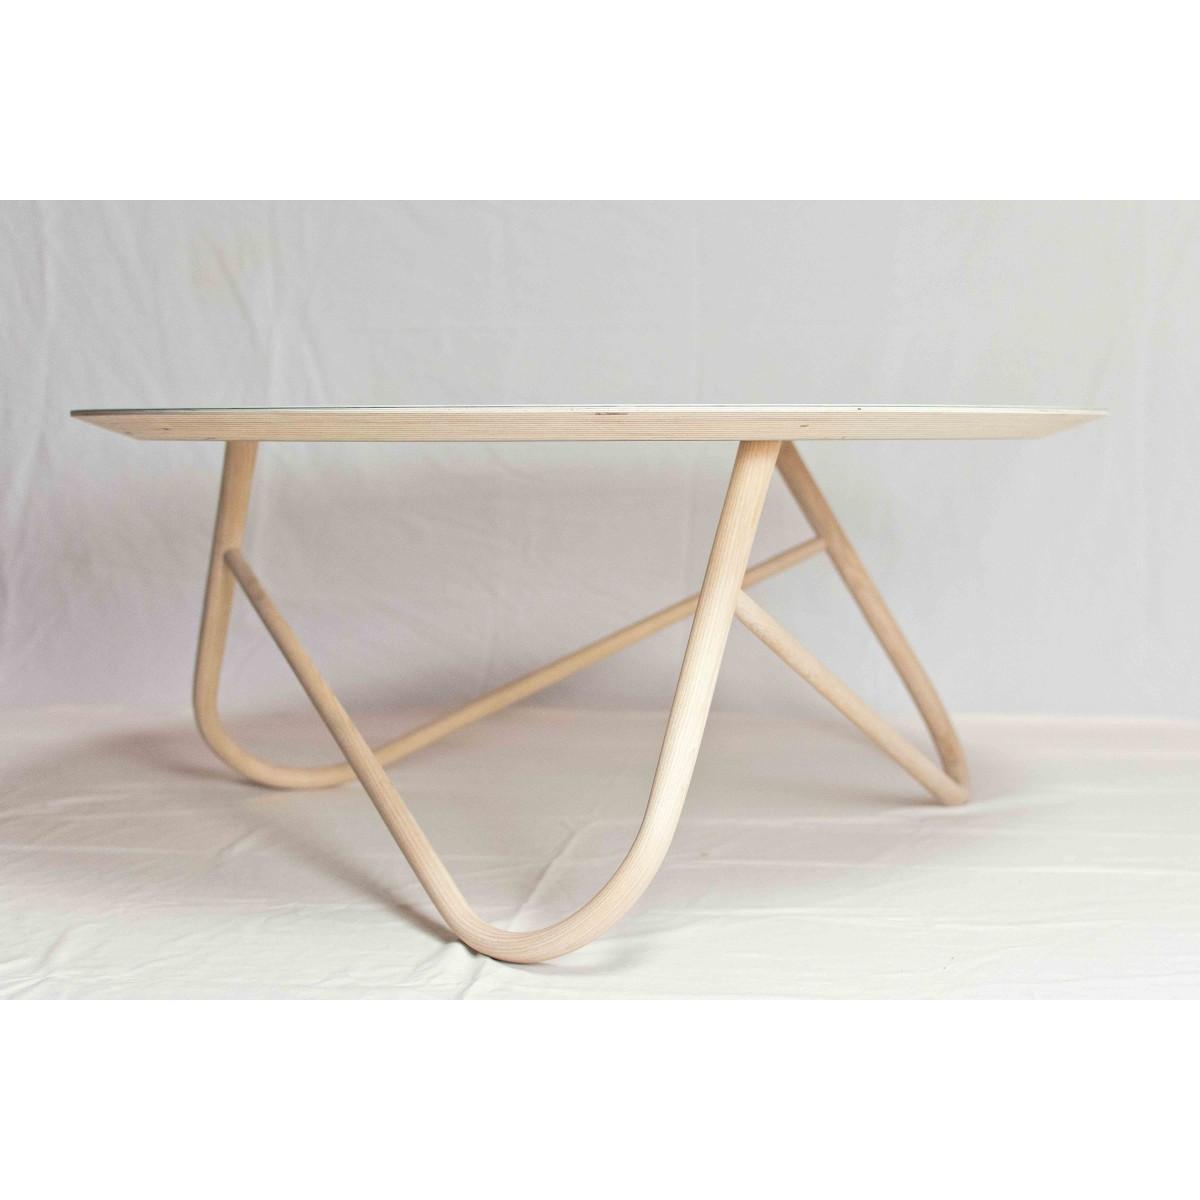 Ta-imo (groß)Möbeldesign Jonas Nitsch